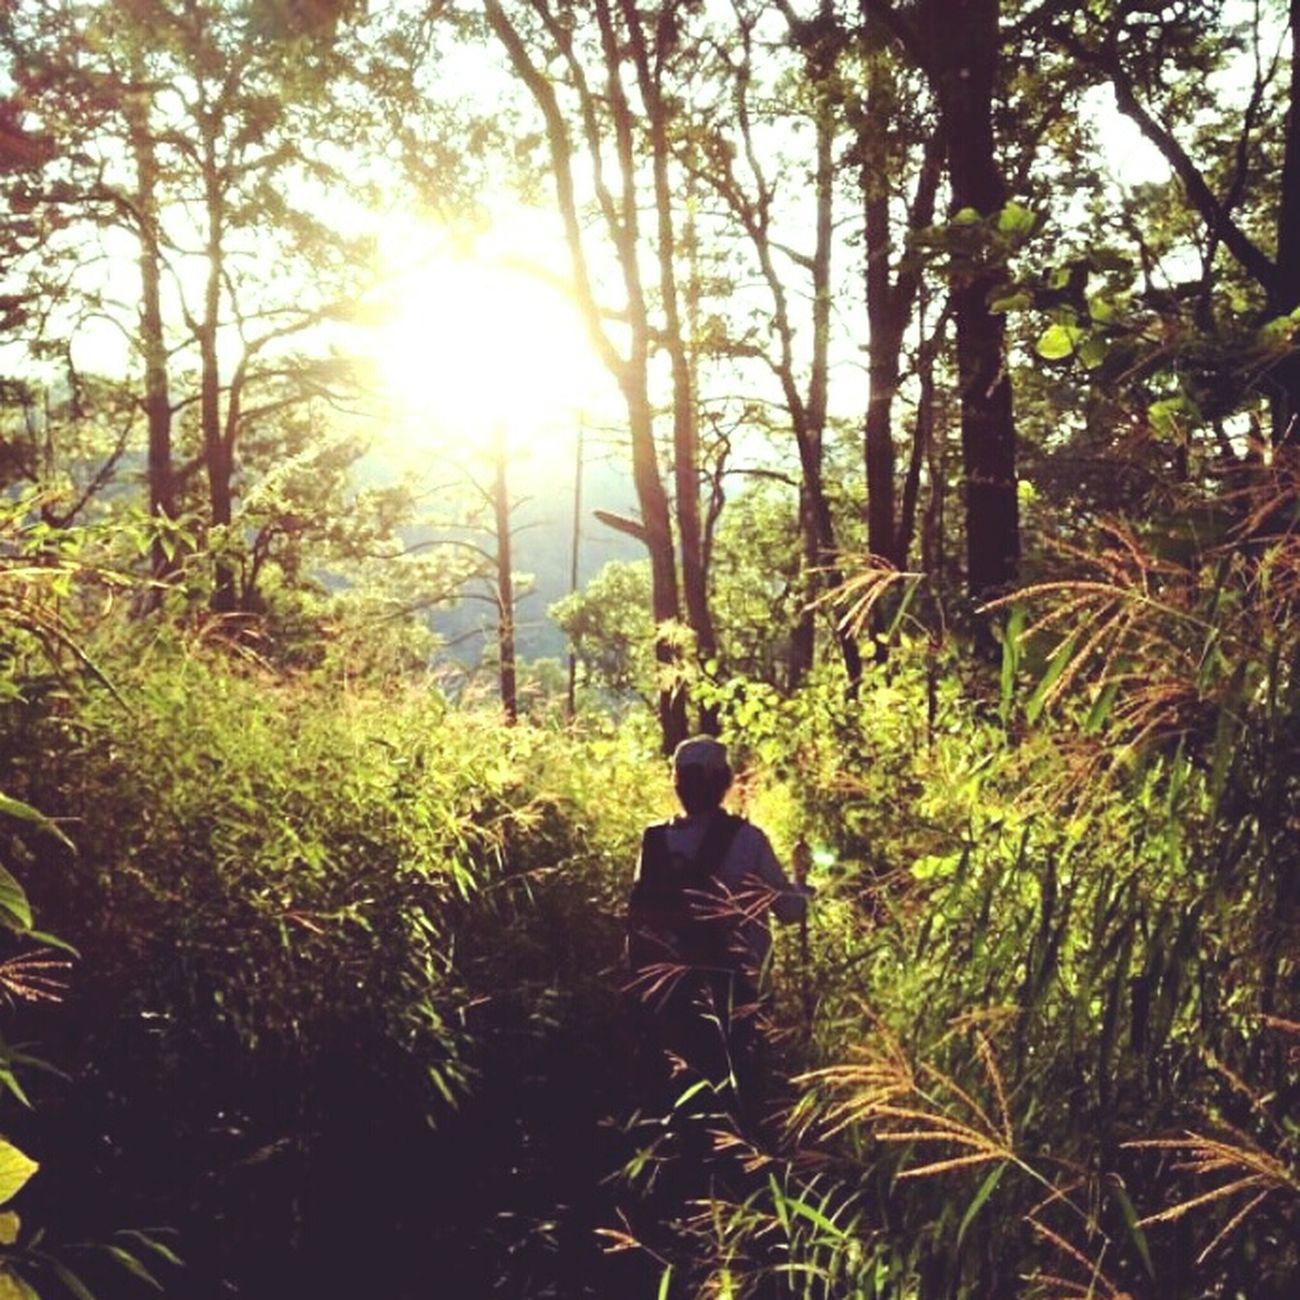 RePicture Leadership Trekking Mountain Doi Luang Doi Luang, Chiang Dao Chiang Dao Chiang Mai Thailand